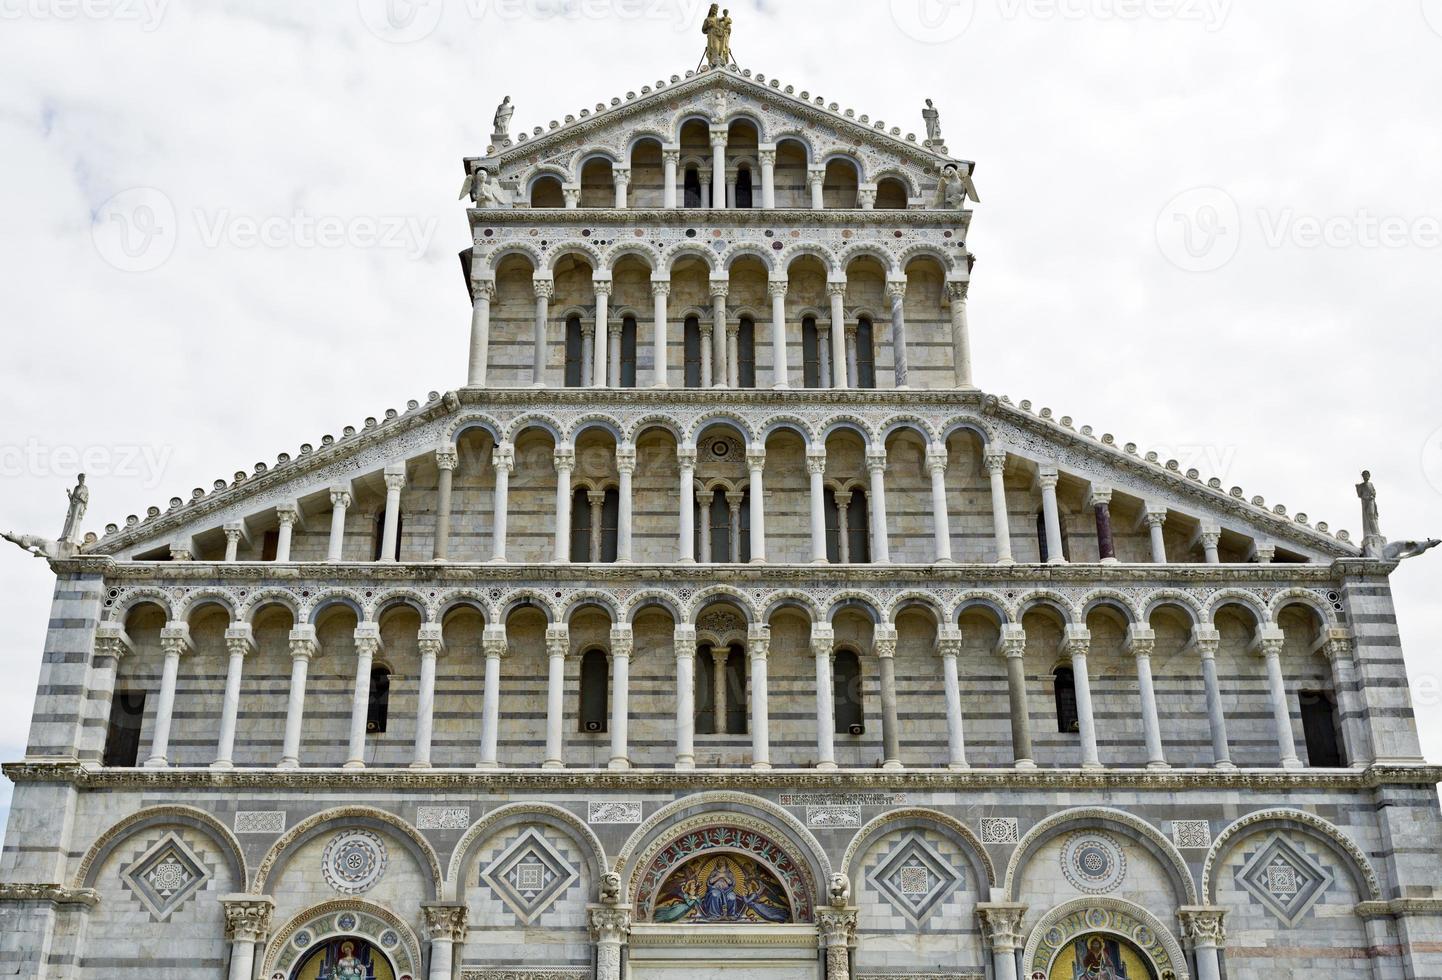 Pisa Cathedral facade photo